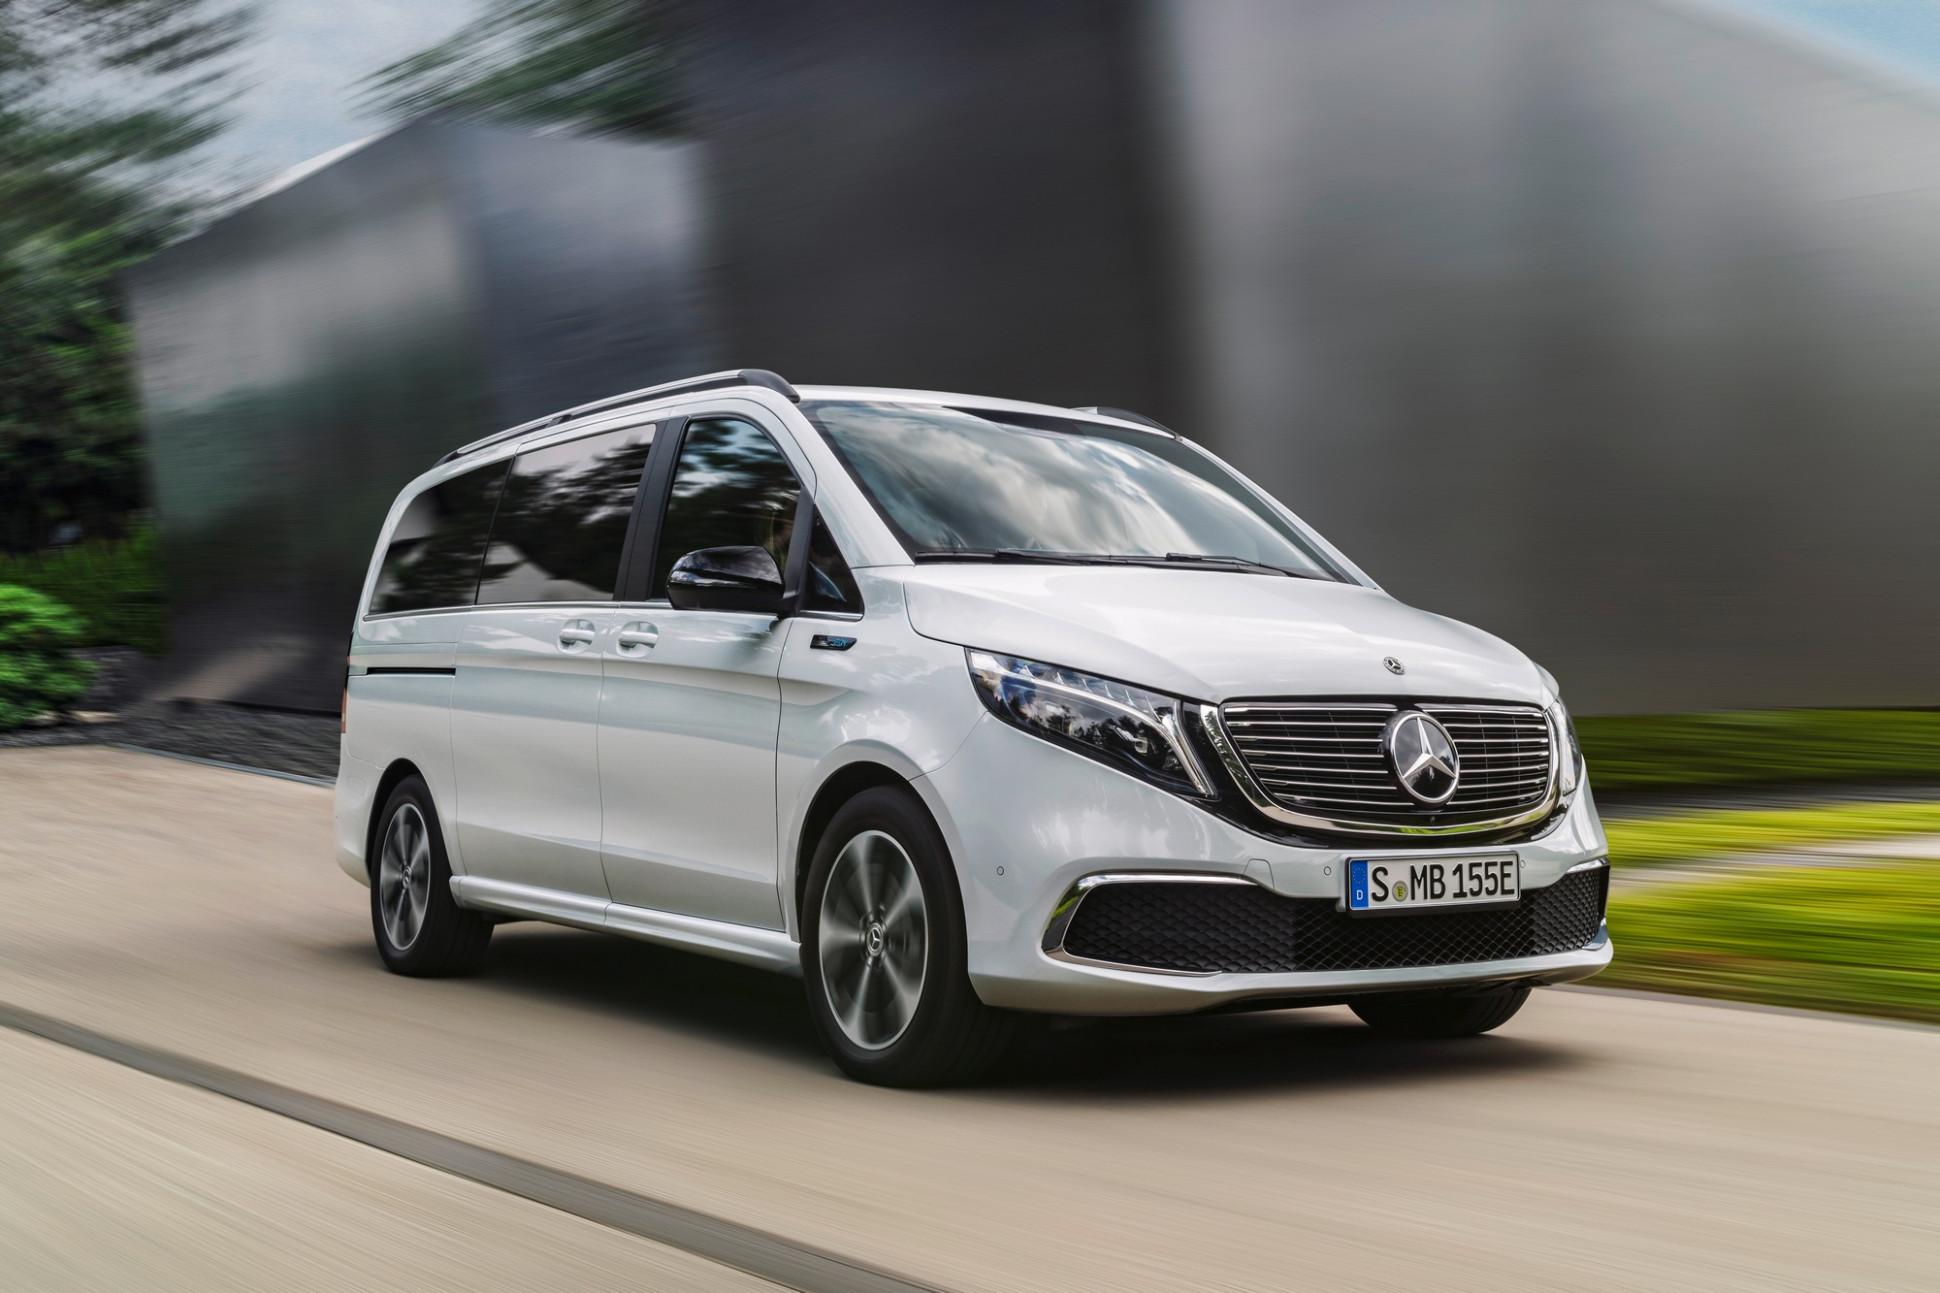 Picture 2022 Mercedes-Benz M-Class